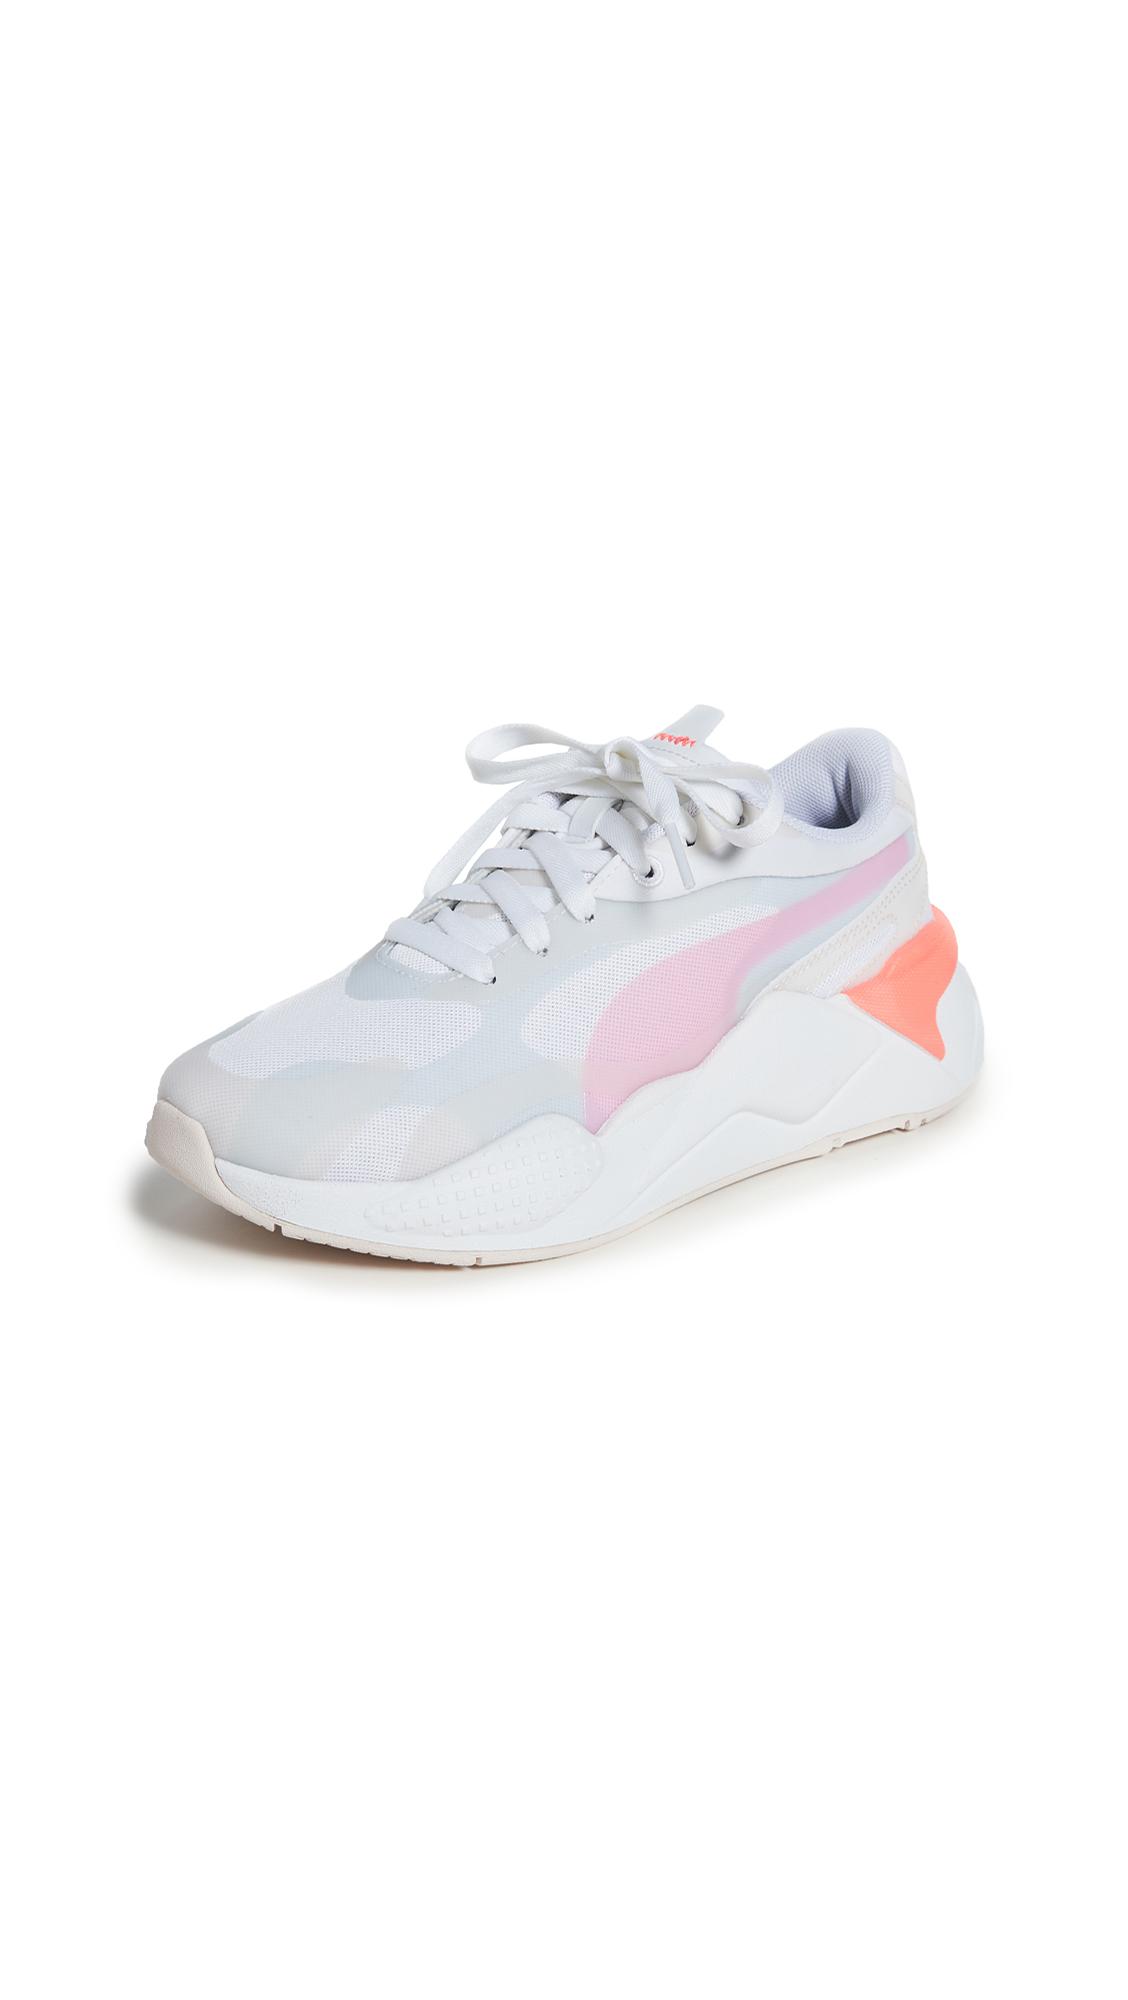 PUMA RS-X Plas Tech Sneakers – 40% Off Sale